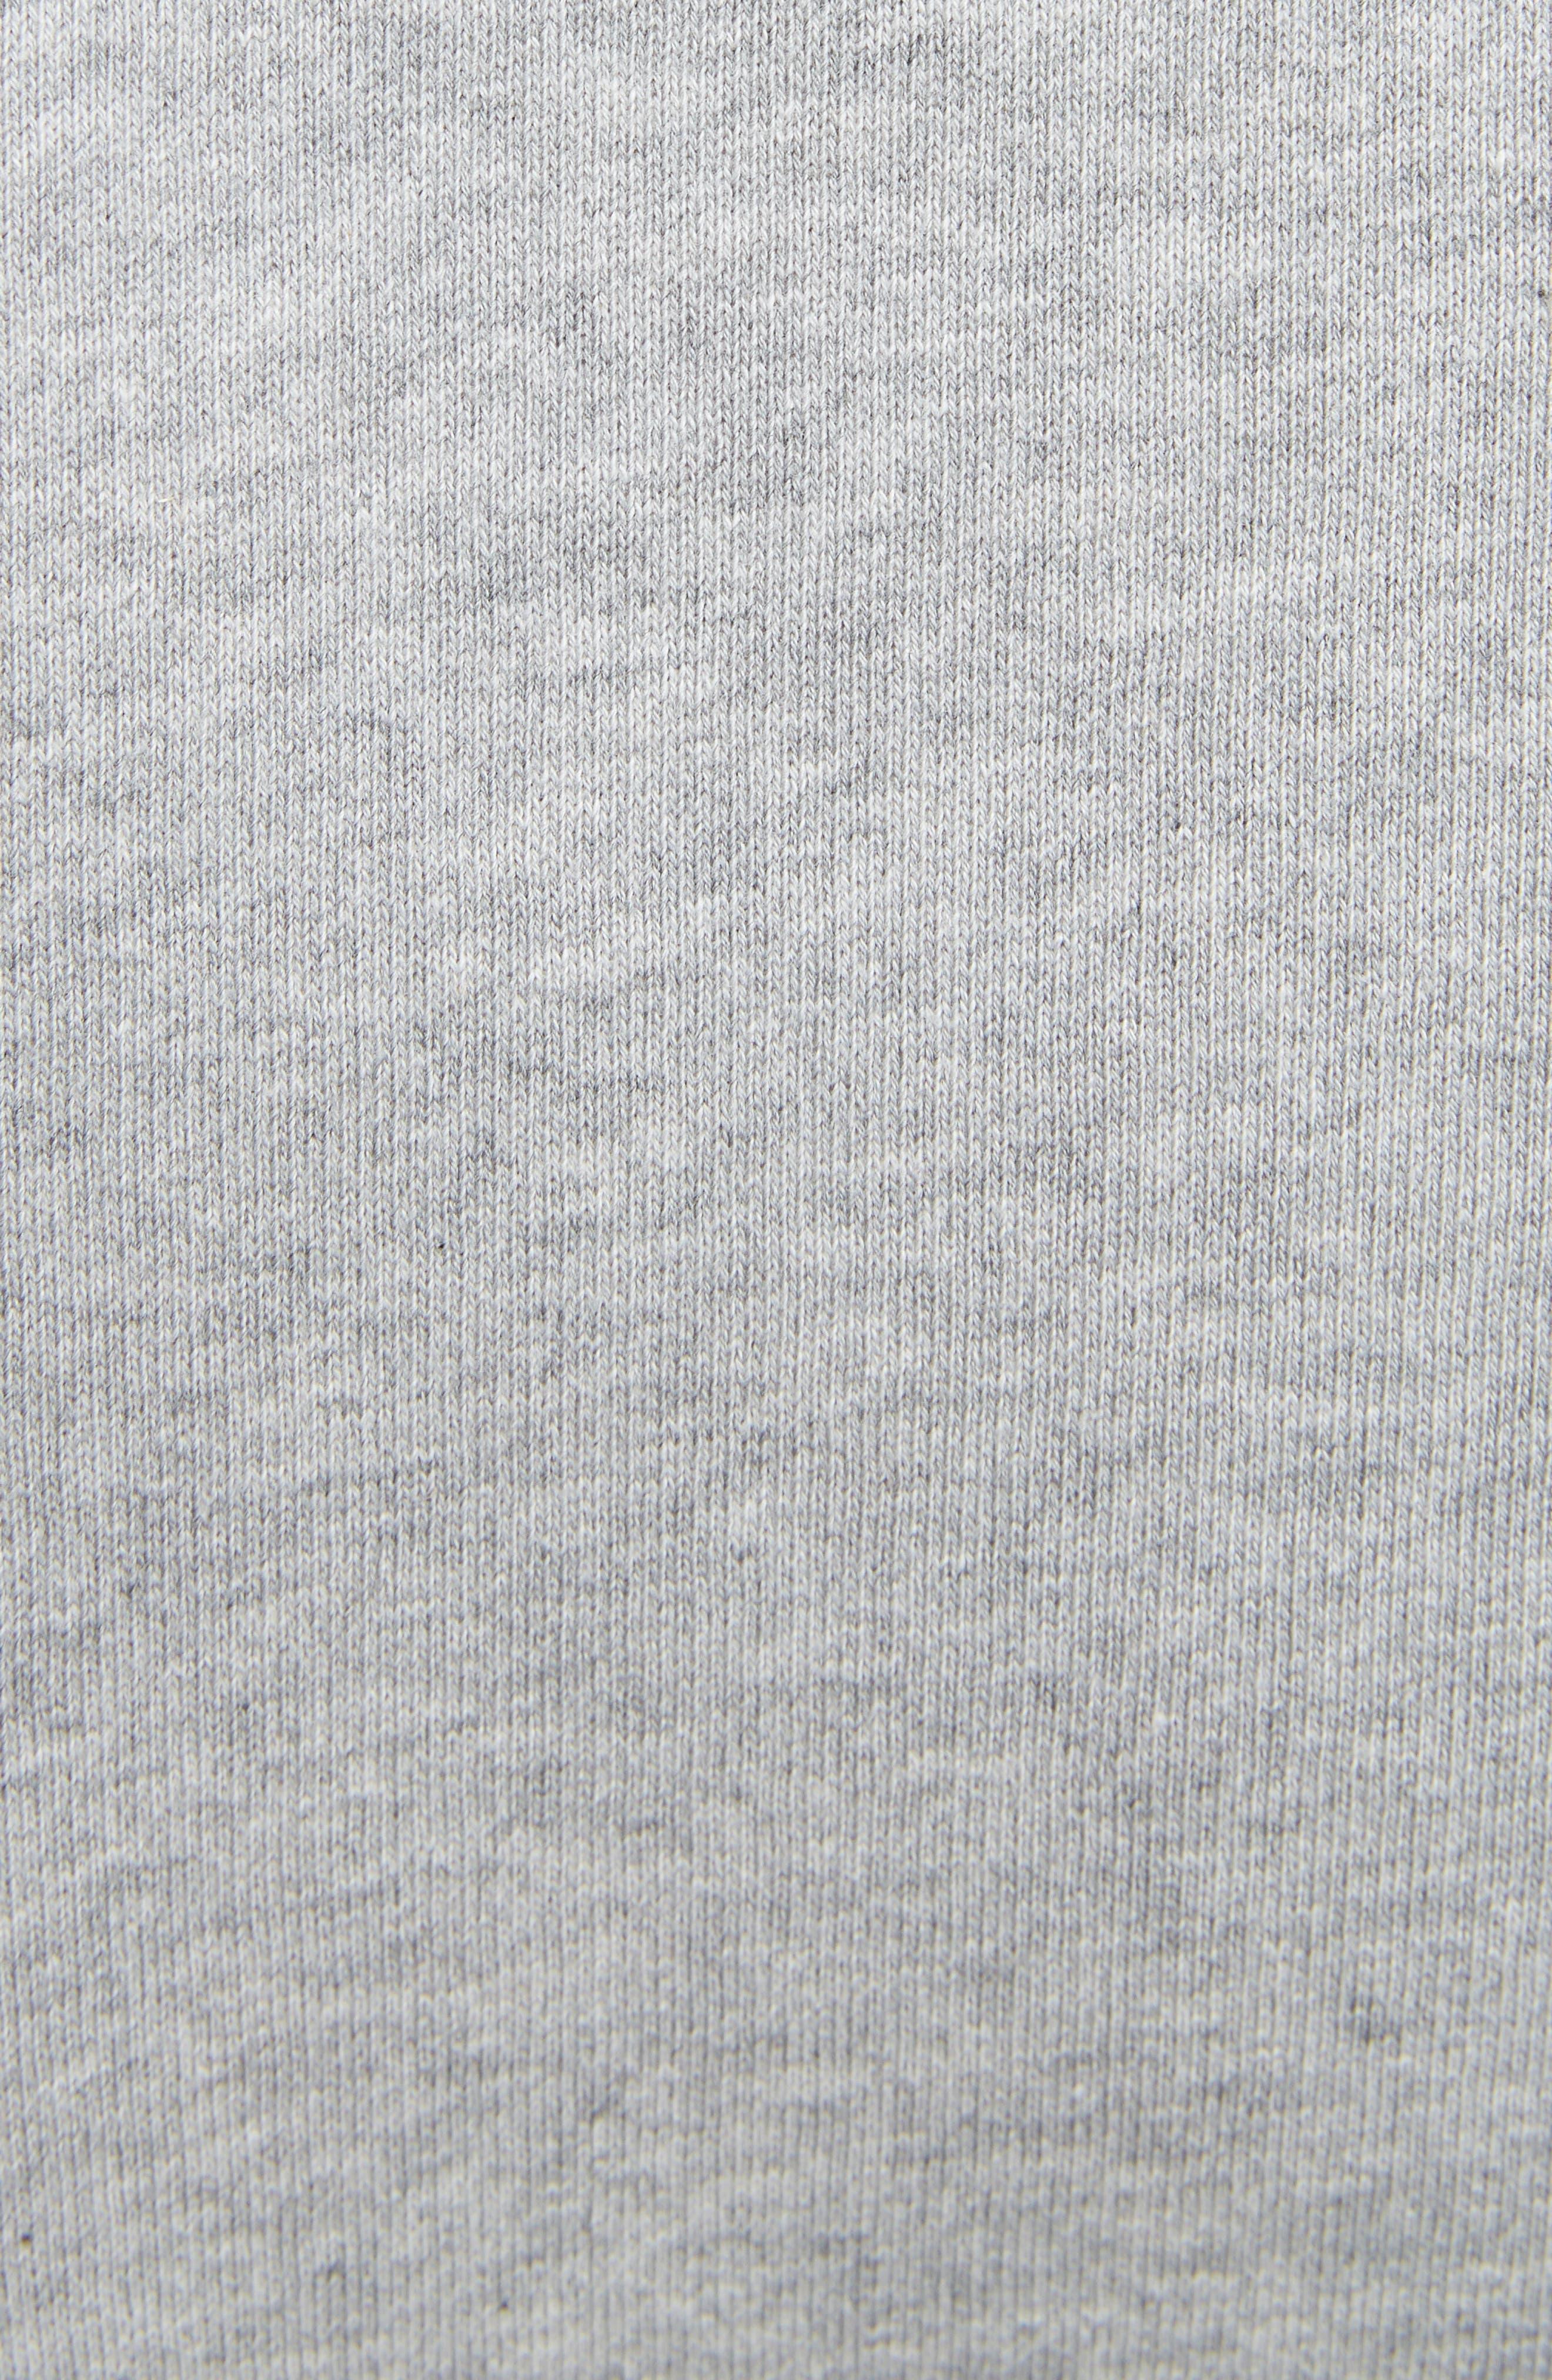 KENZO, Tiger Sweatshirt, Alternate thumbnail 5, color, PEARL GREY